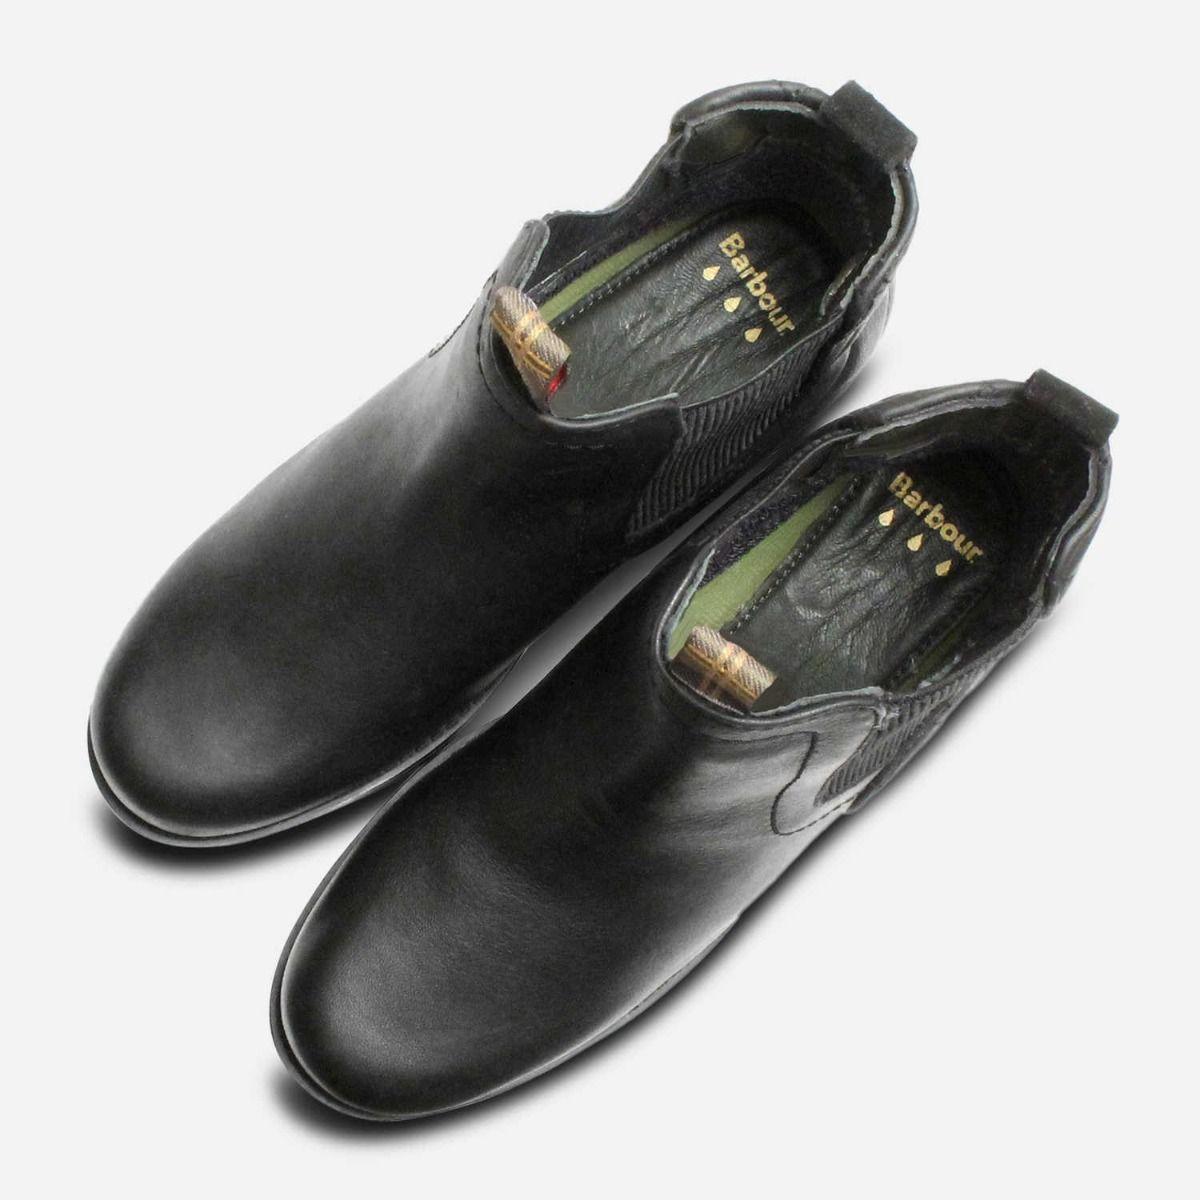 Barbour Weatherproof Black Ladies Rimini Chelsea Boots